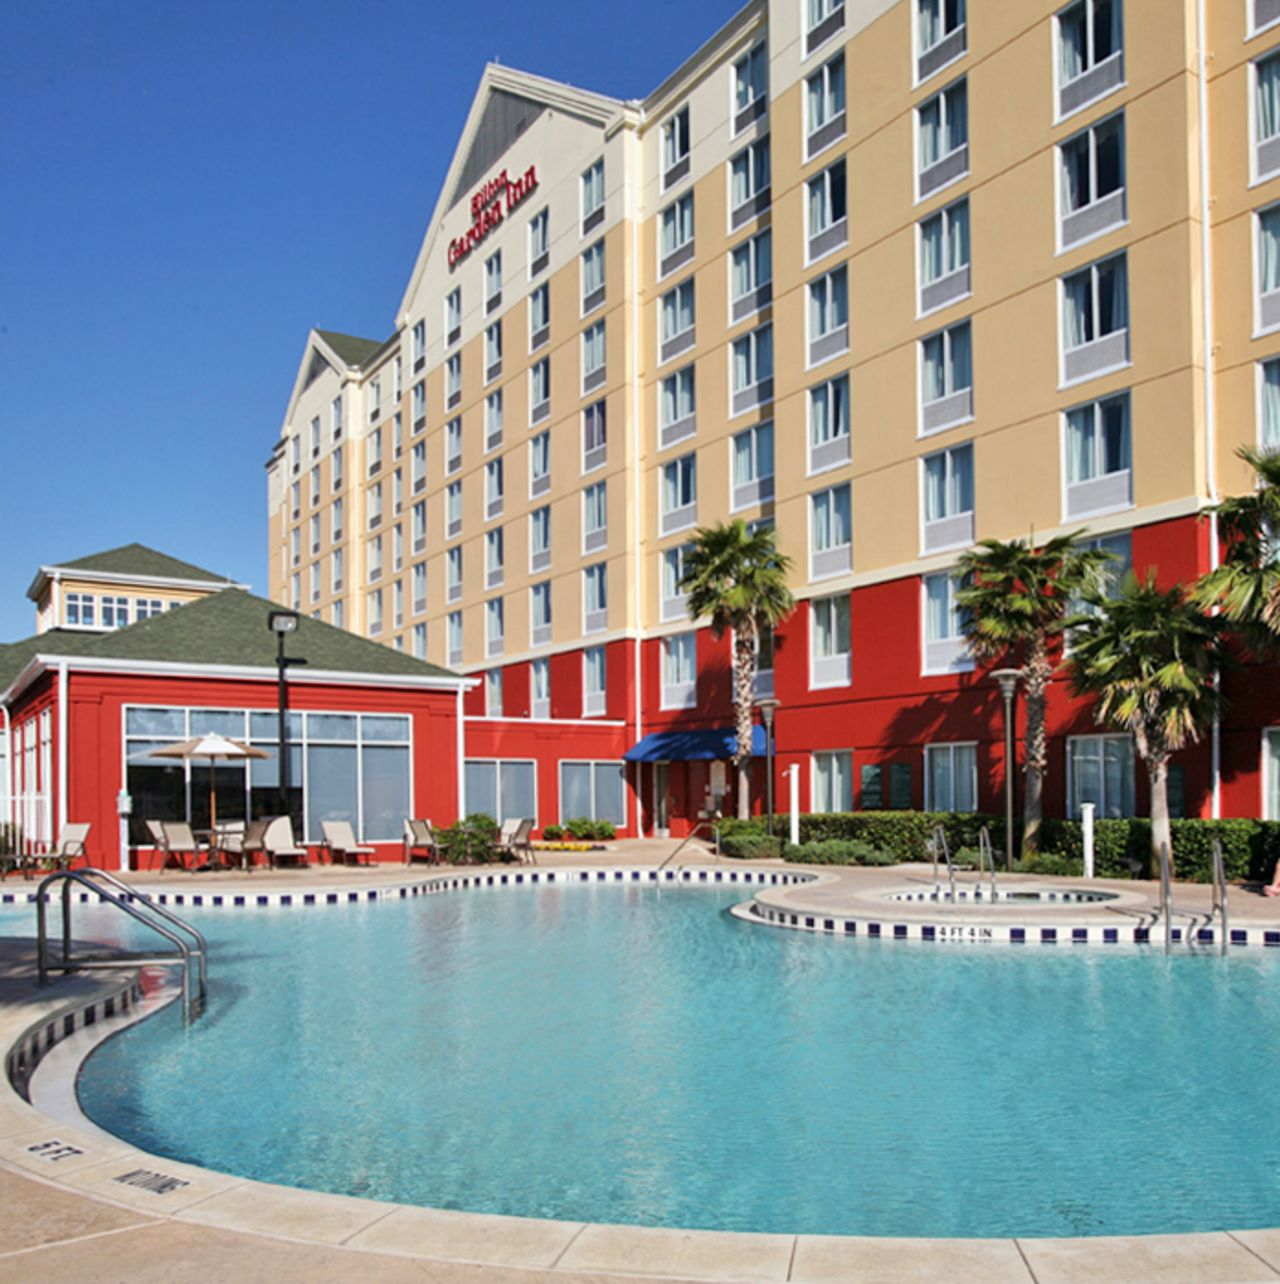 Hotel florida hilton garden inn at seaworld canusa Hilton garden inn orlando at seaworld